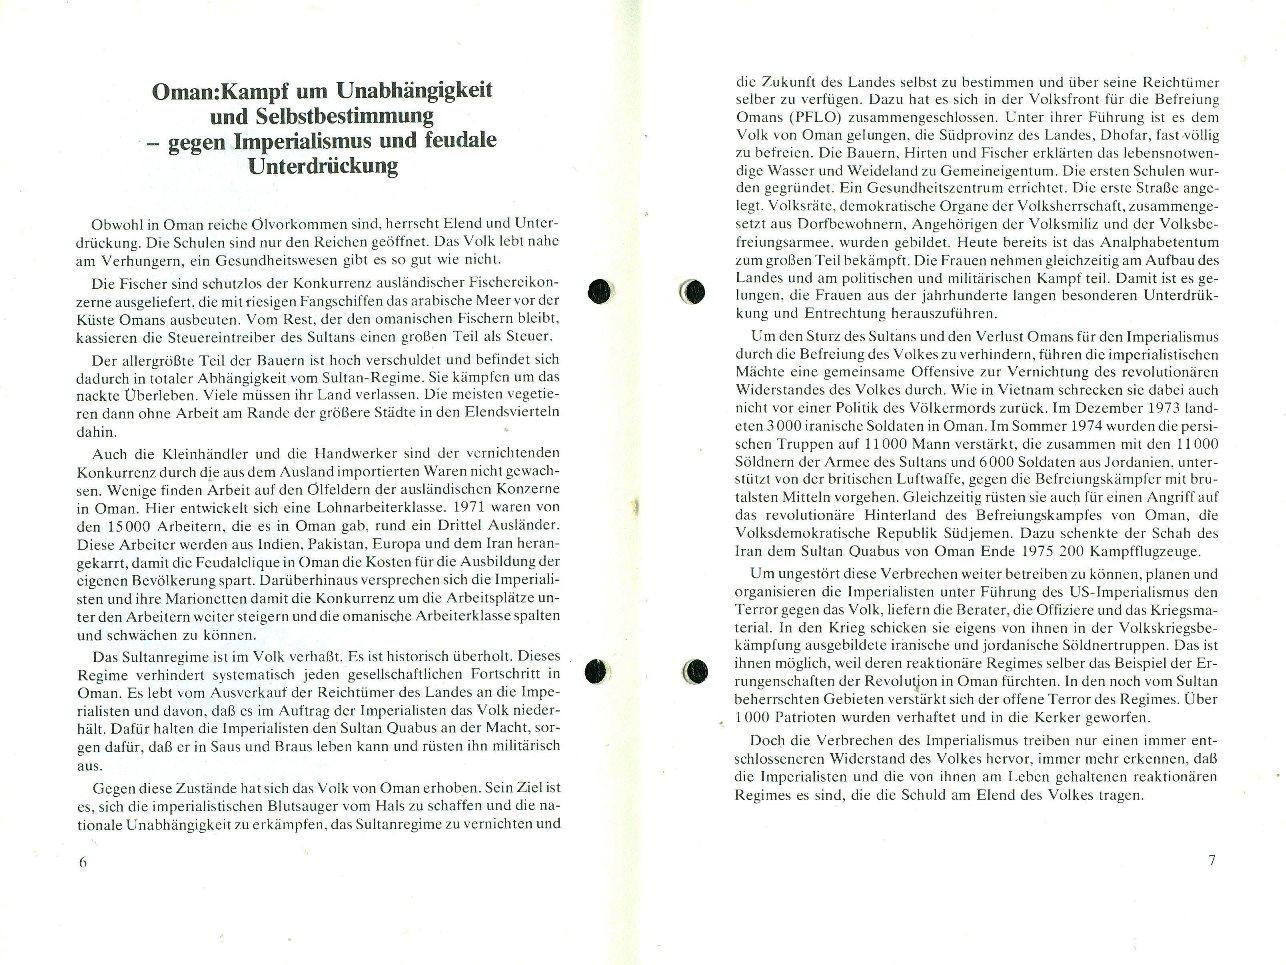 Freiburg_KBW_Oman020